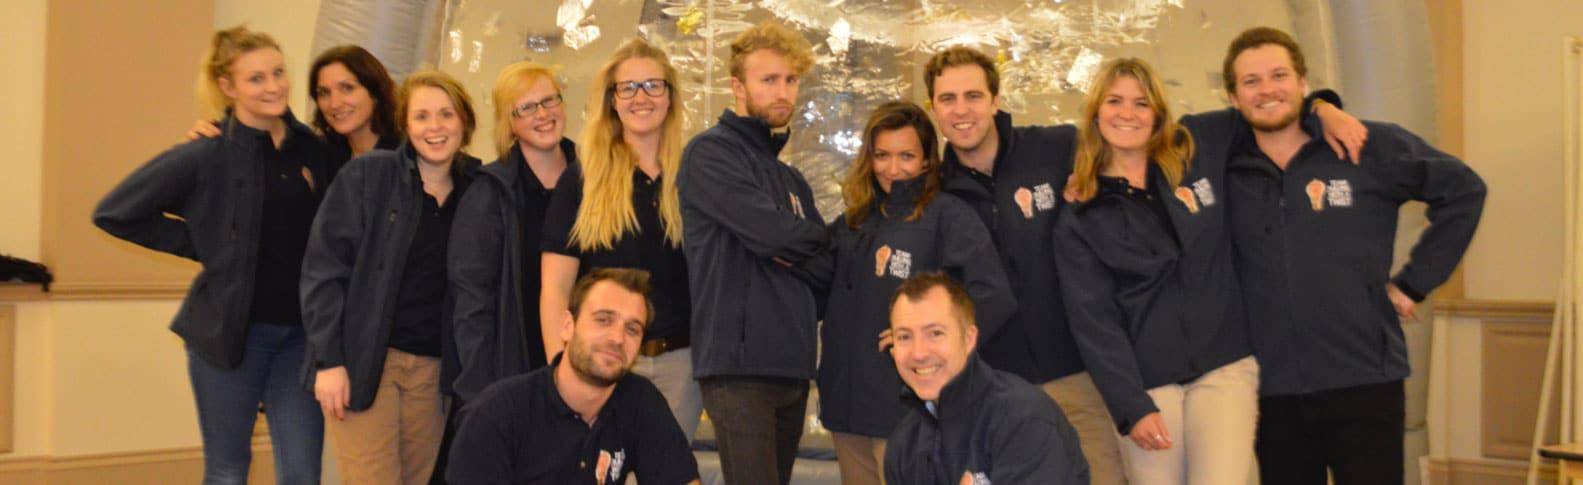 Indoor Crystal Maze Team Building Event